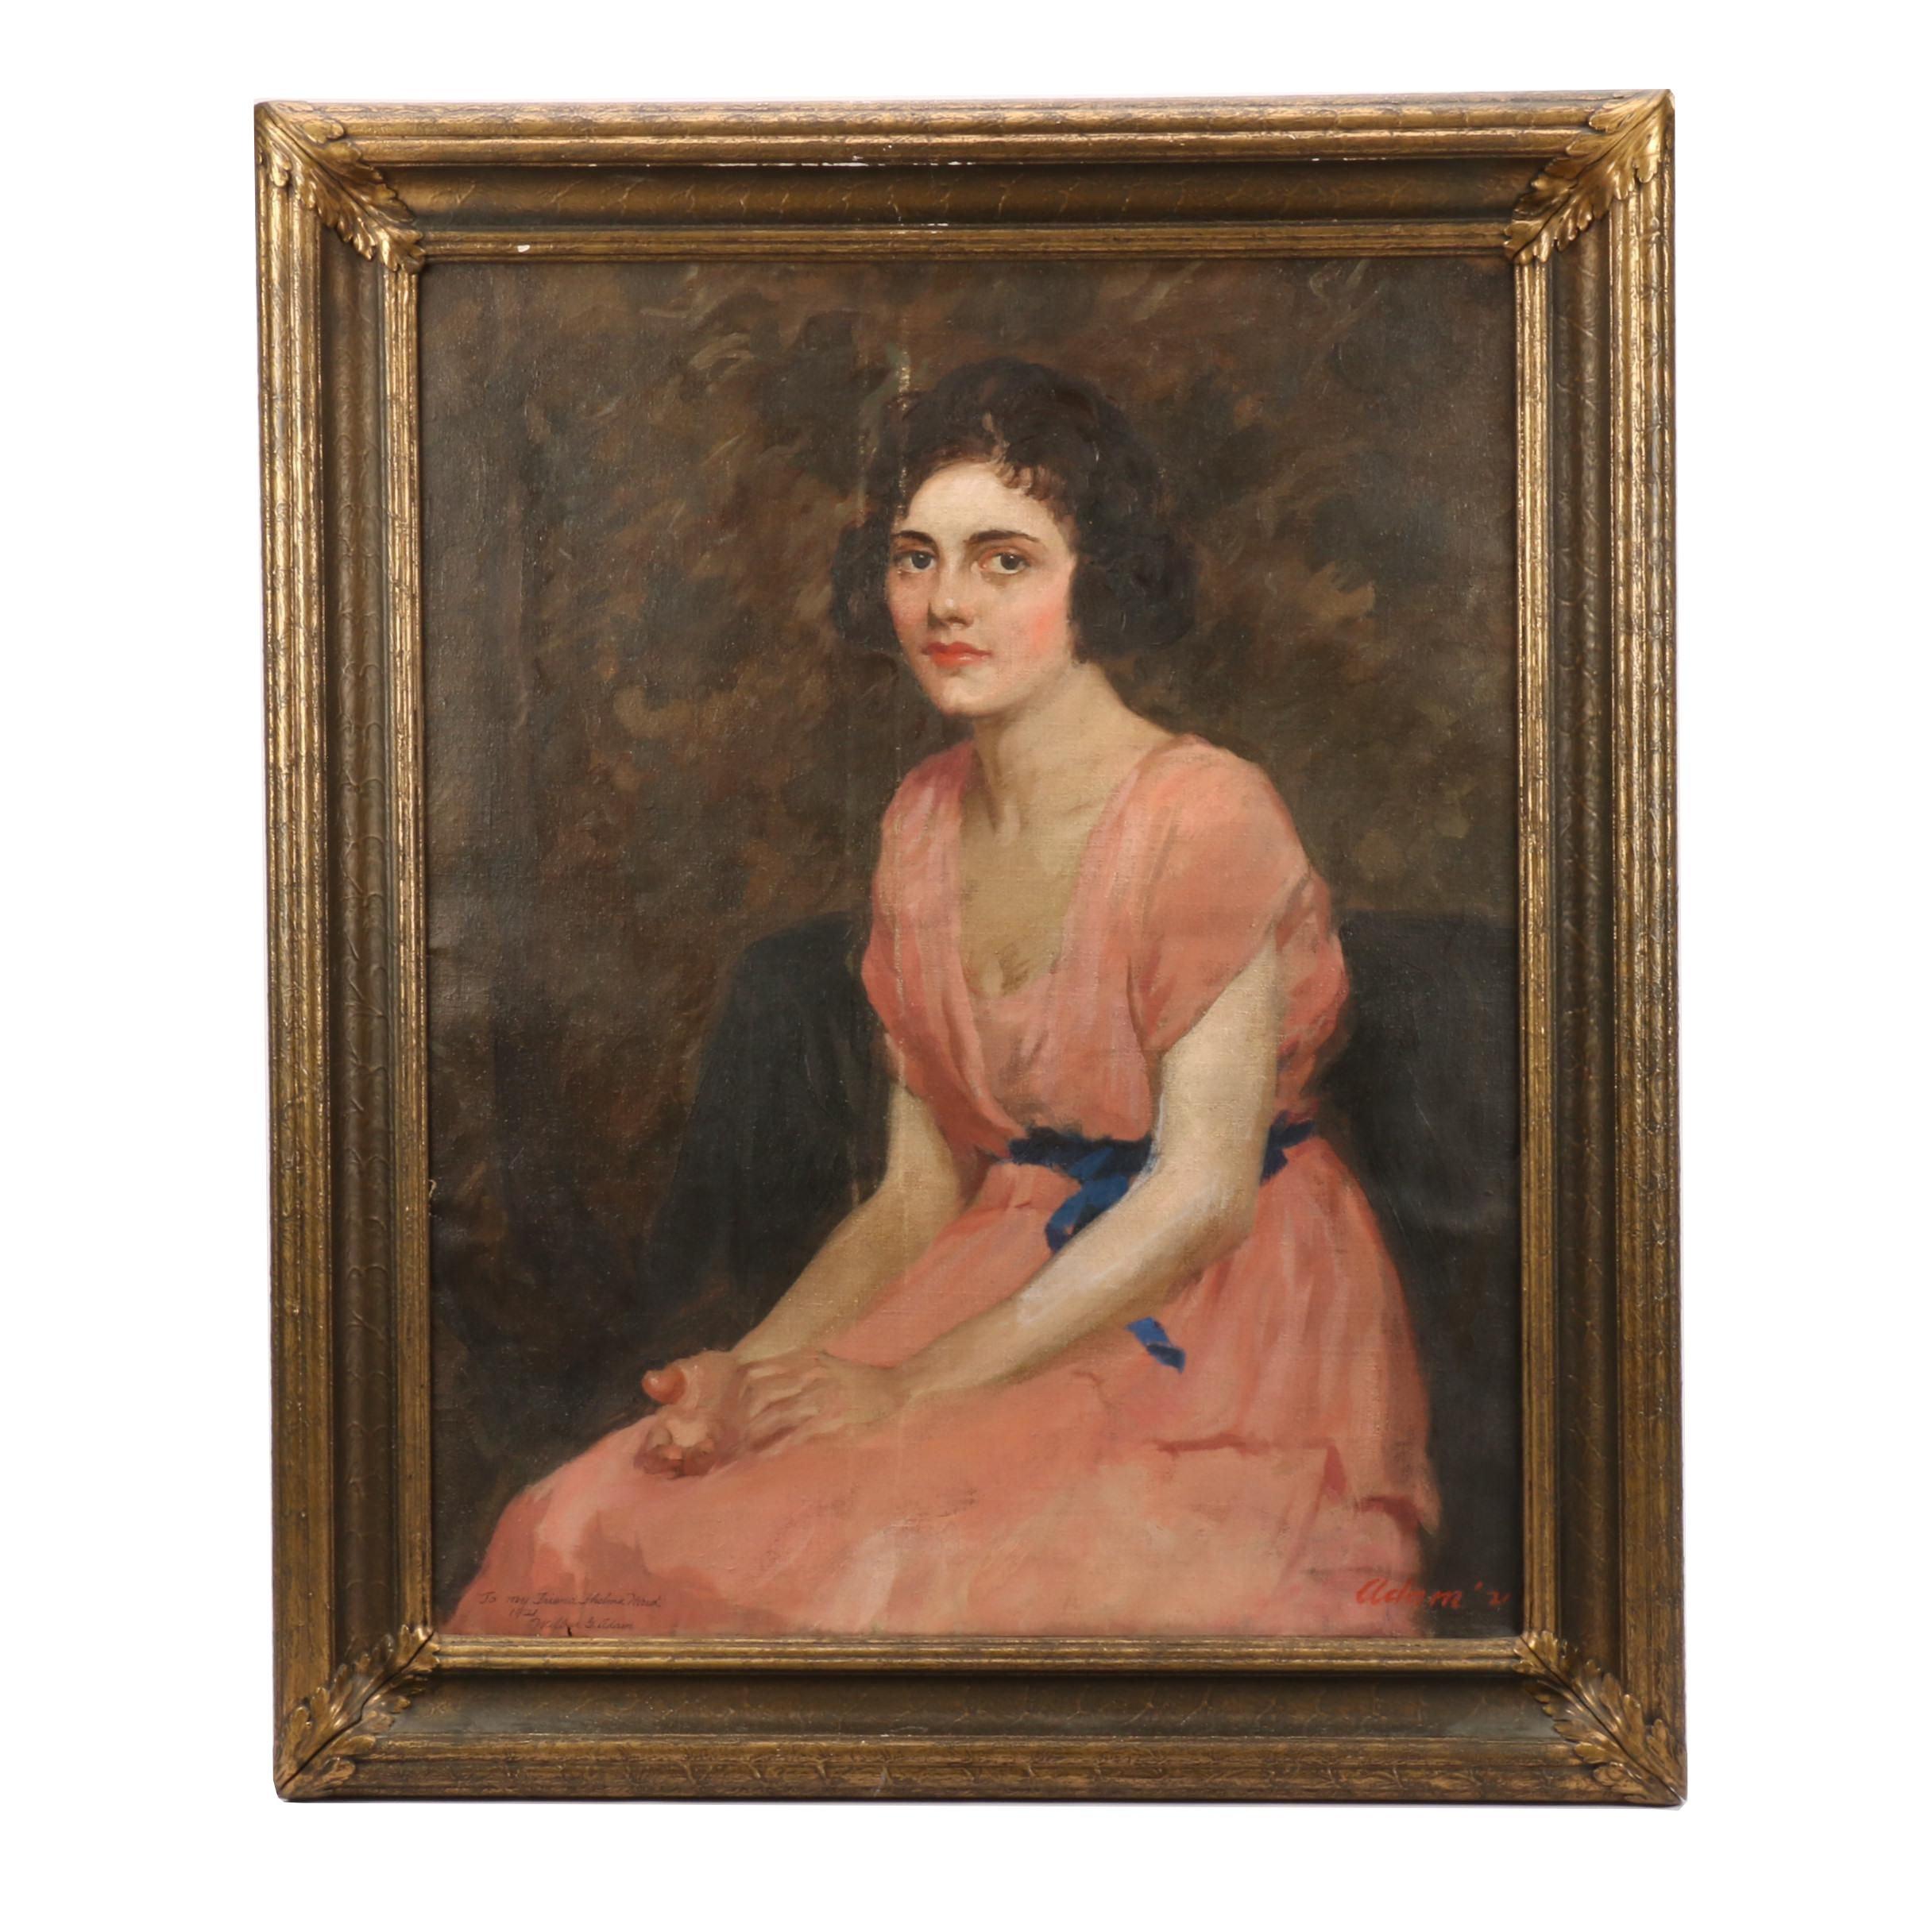 Wilbur G. Adam 1921 Portrait Oil Painting of Woman in Pink Dress